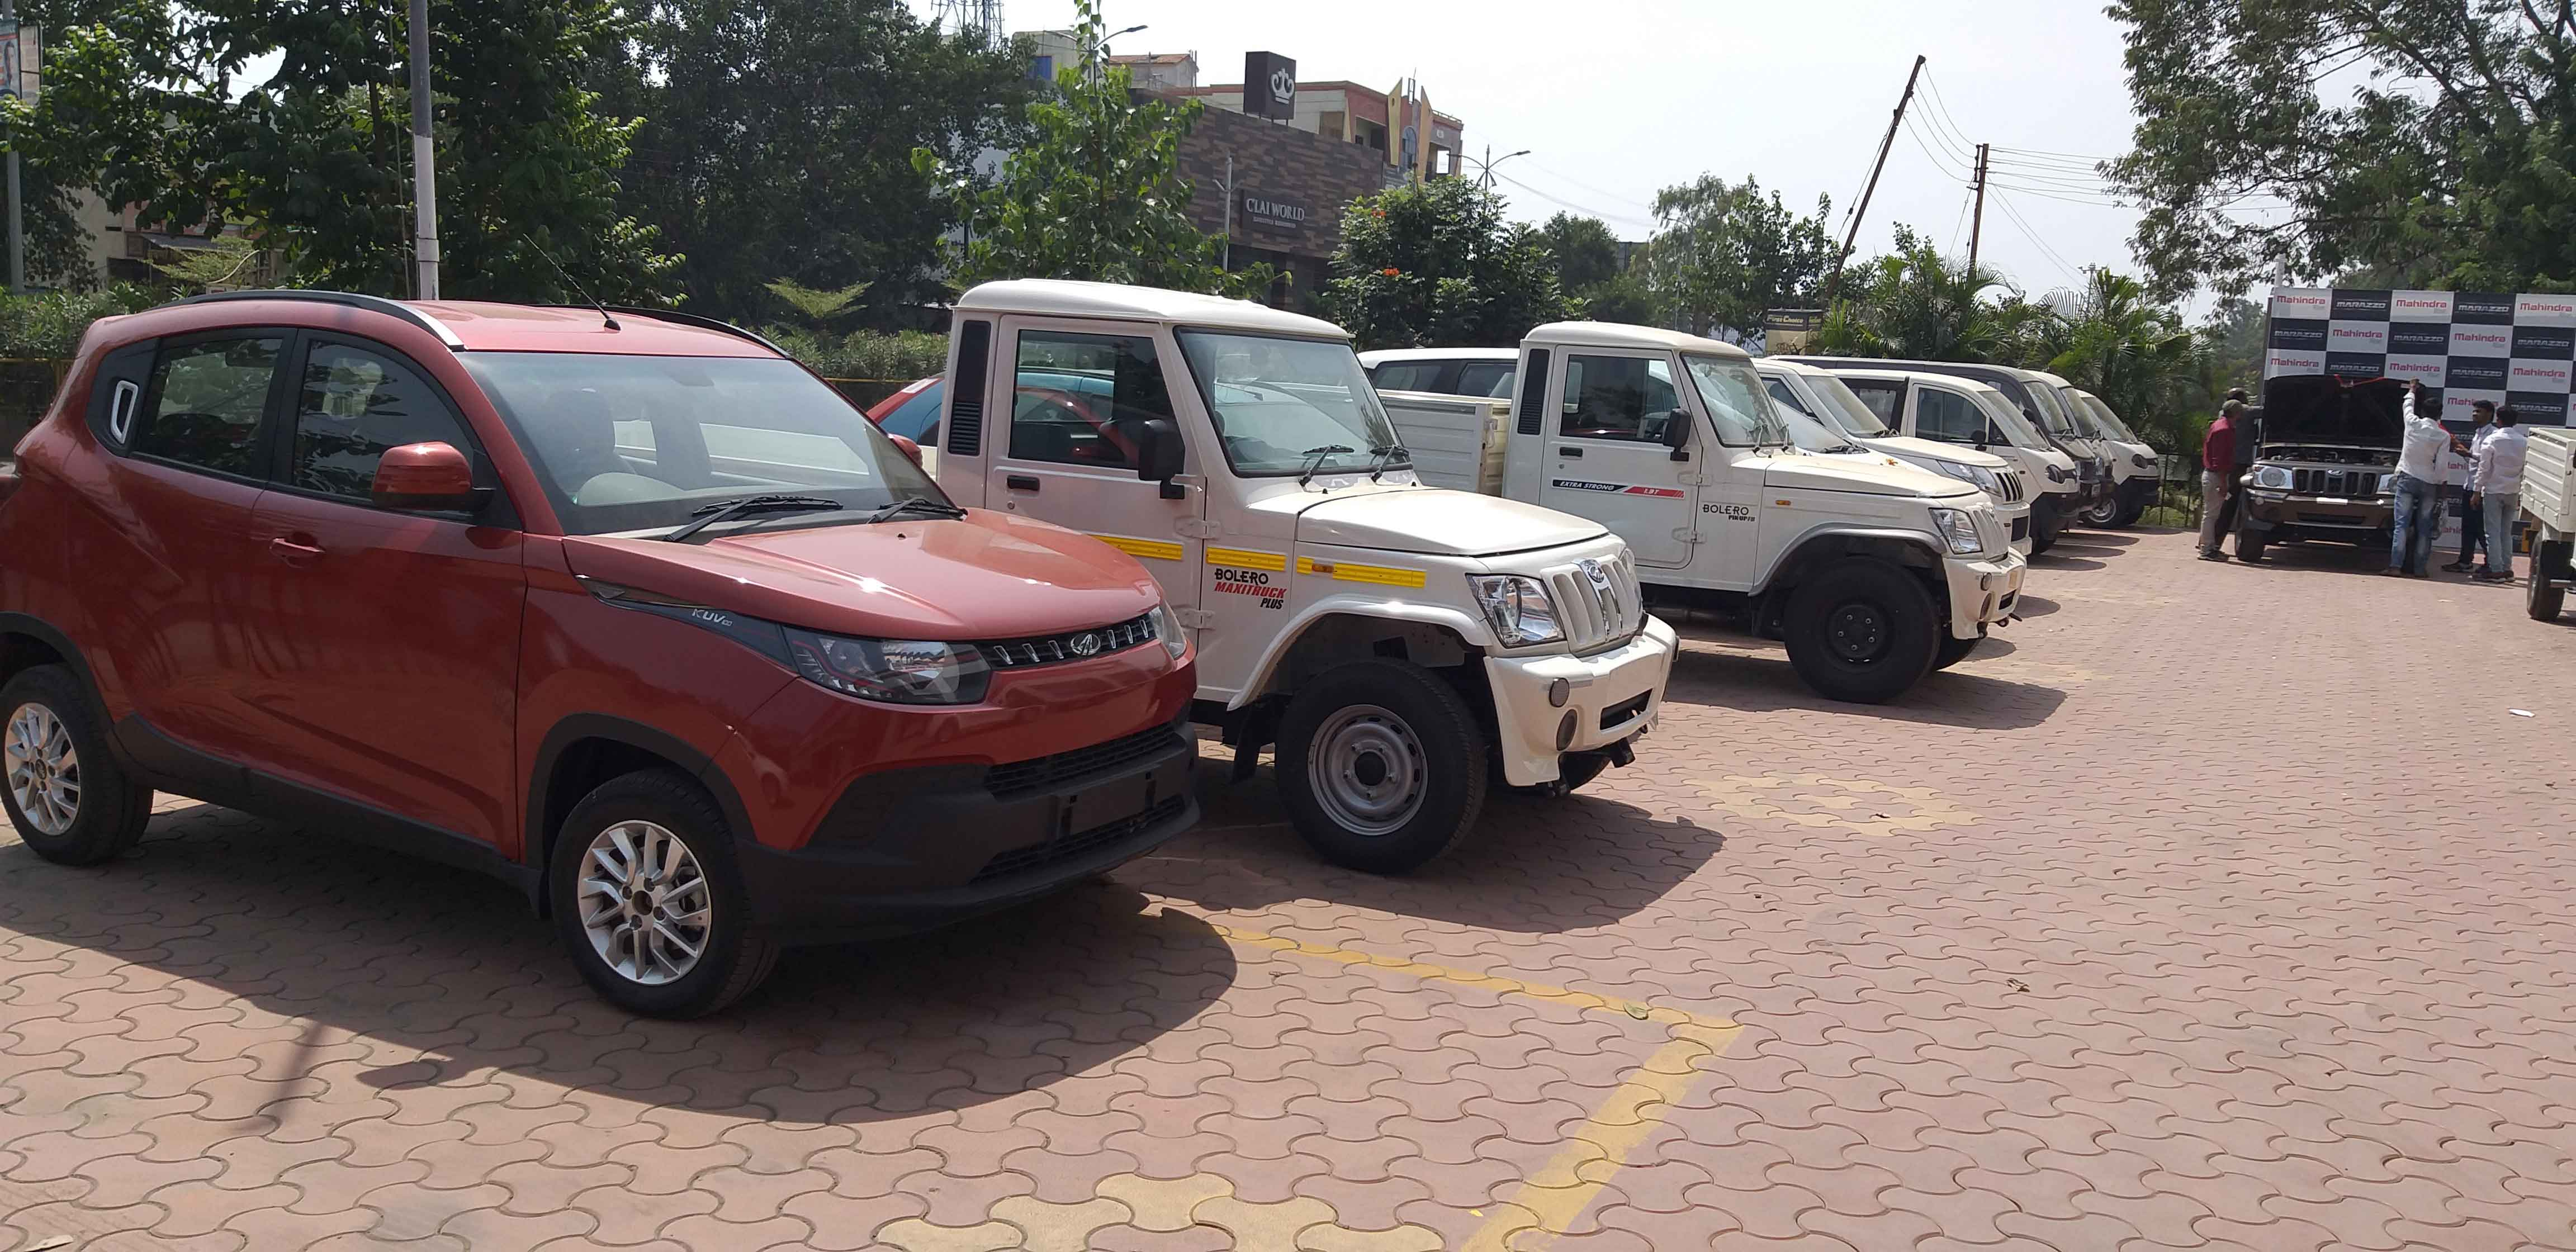 Indomobil Mahindra Showroom, Latur